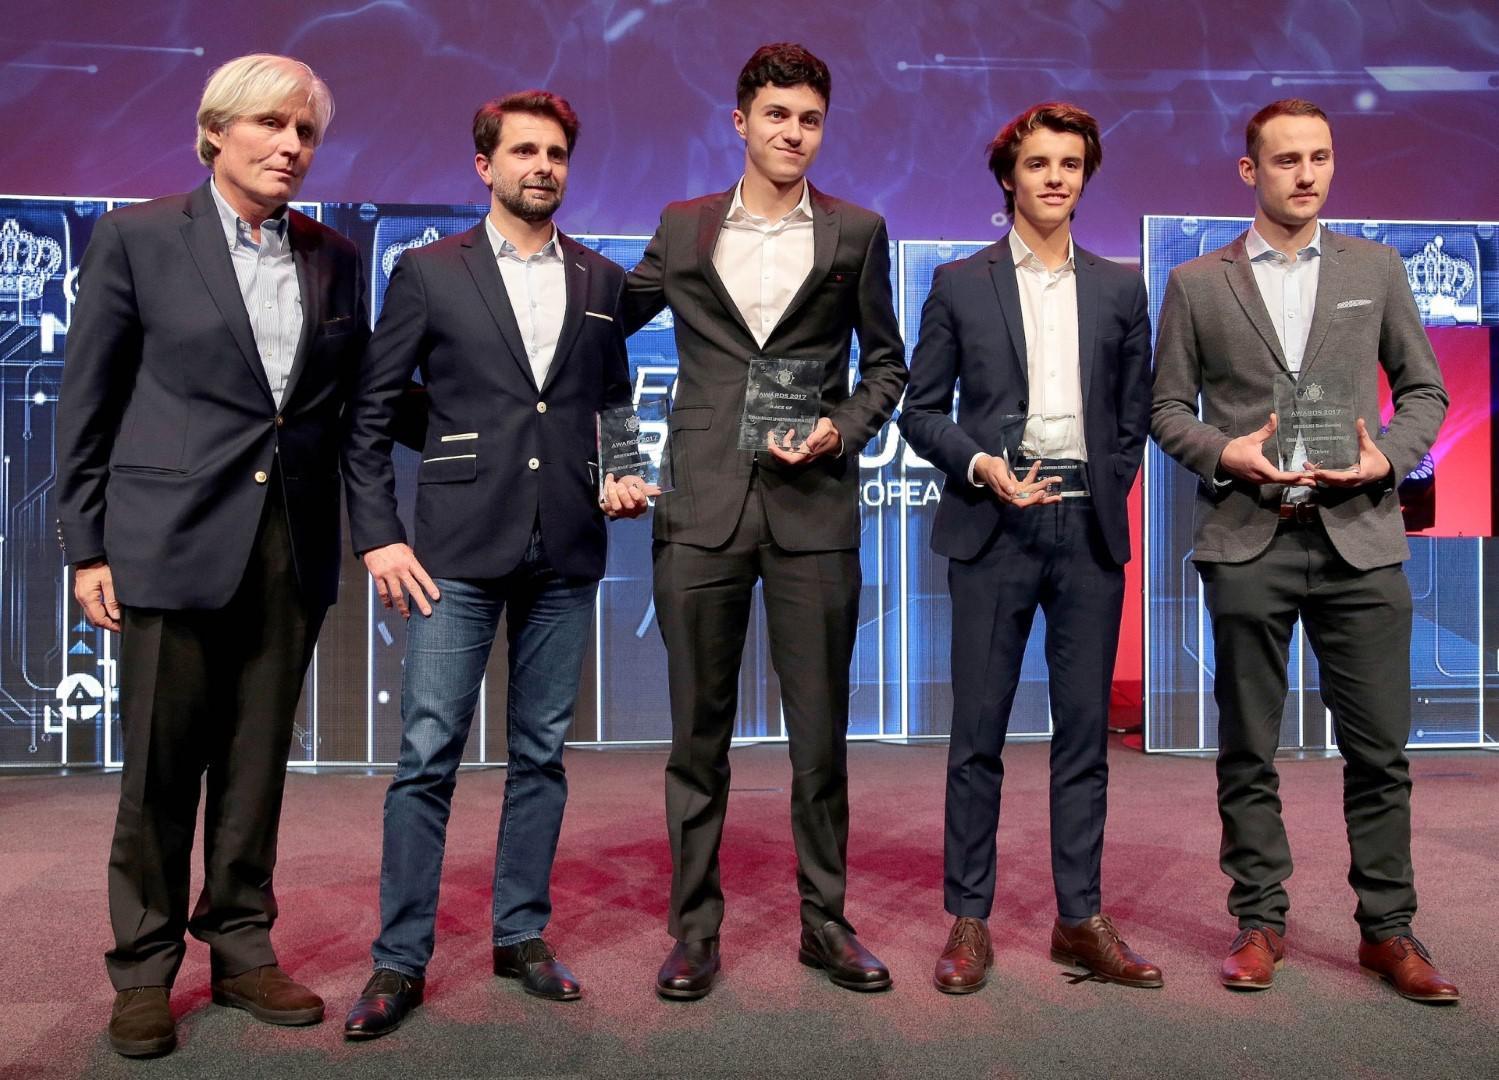 Michael Benyahia honoré par le Royal Automobile Club de Belgique (RACB) تكريم في حفلة نادي السيارات الملكي لبلجيكا